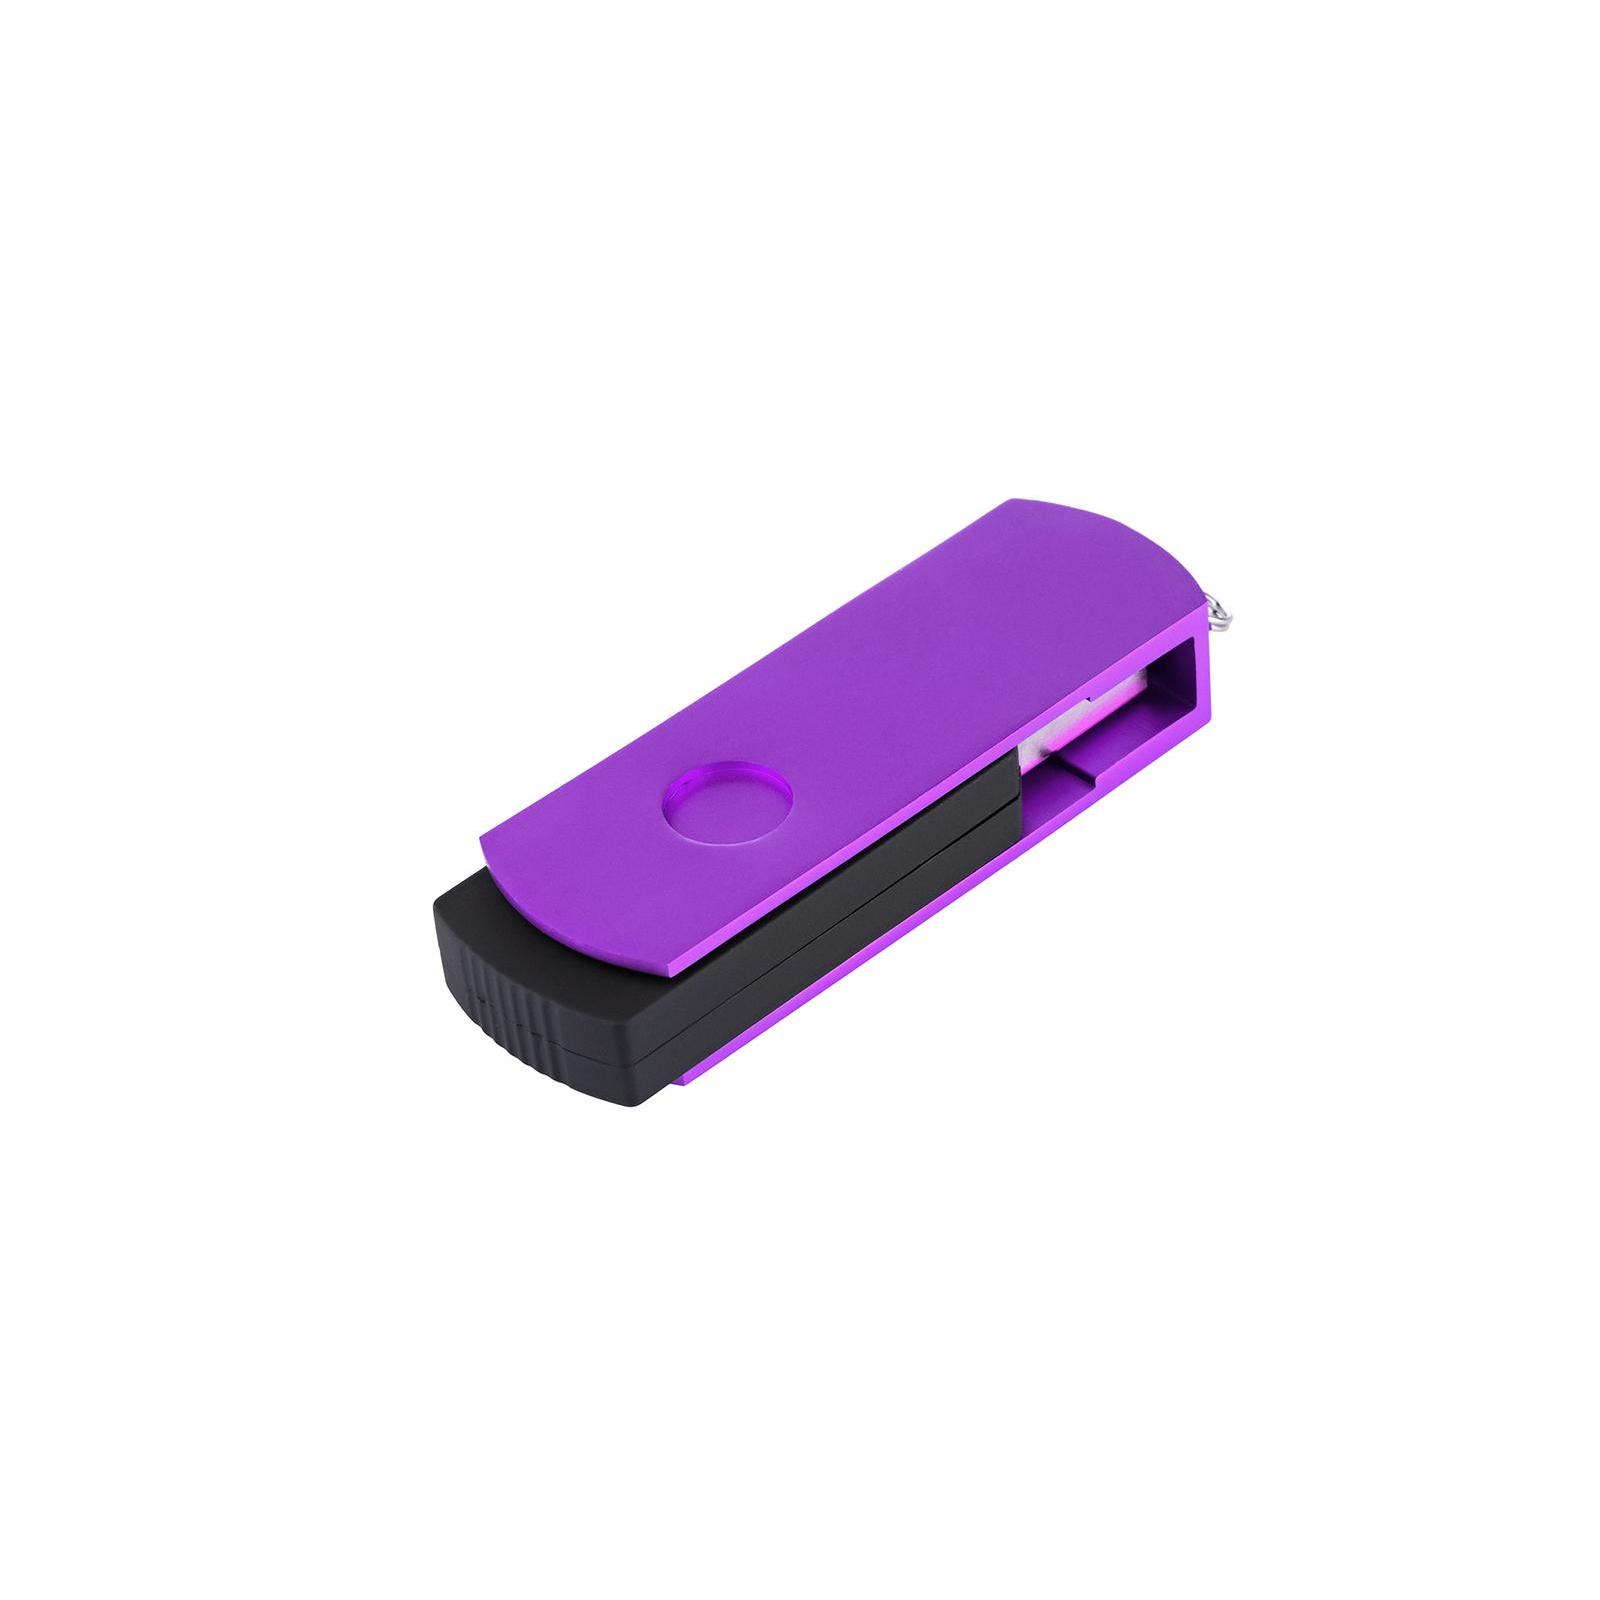 USB флеш накопитель eXceleram 64GB P2 Series Red/Black USB 2.0 (EXP2U2REB64) изображение 6